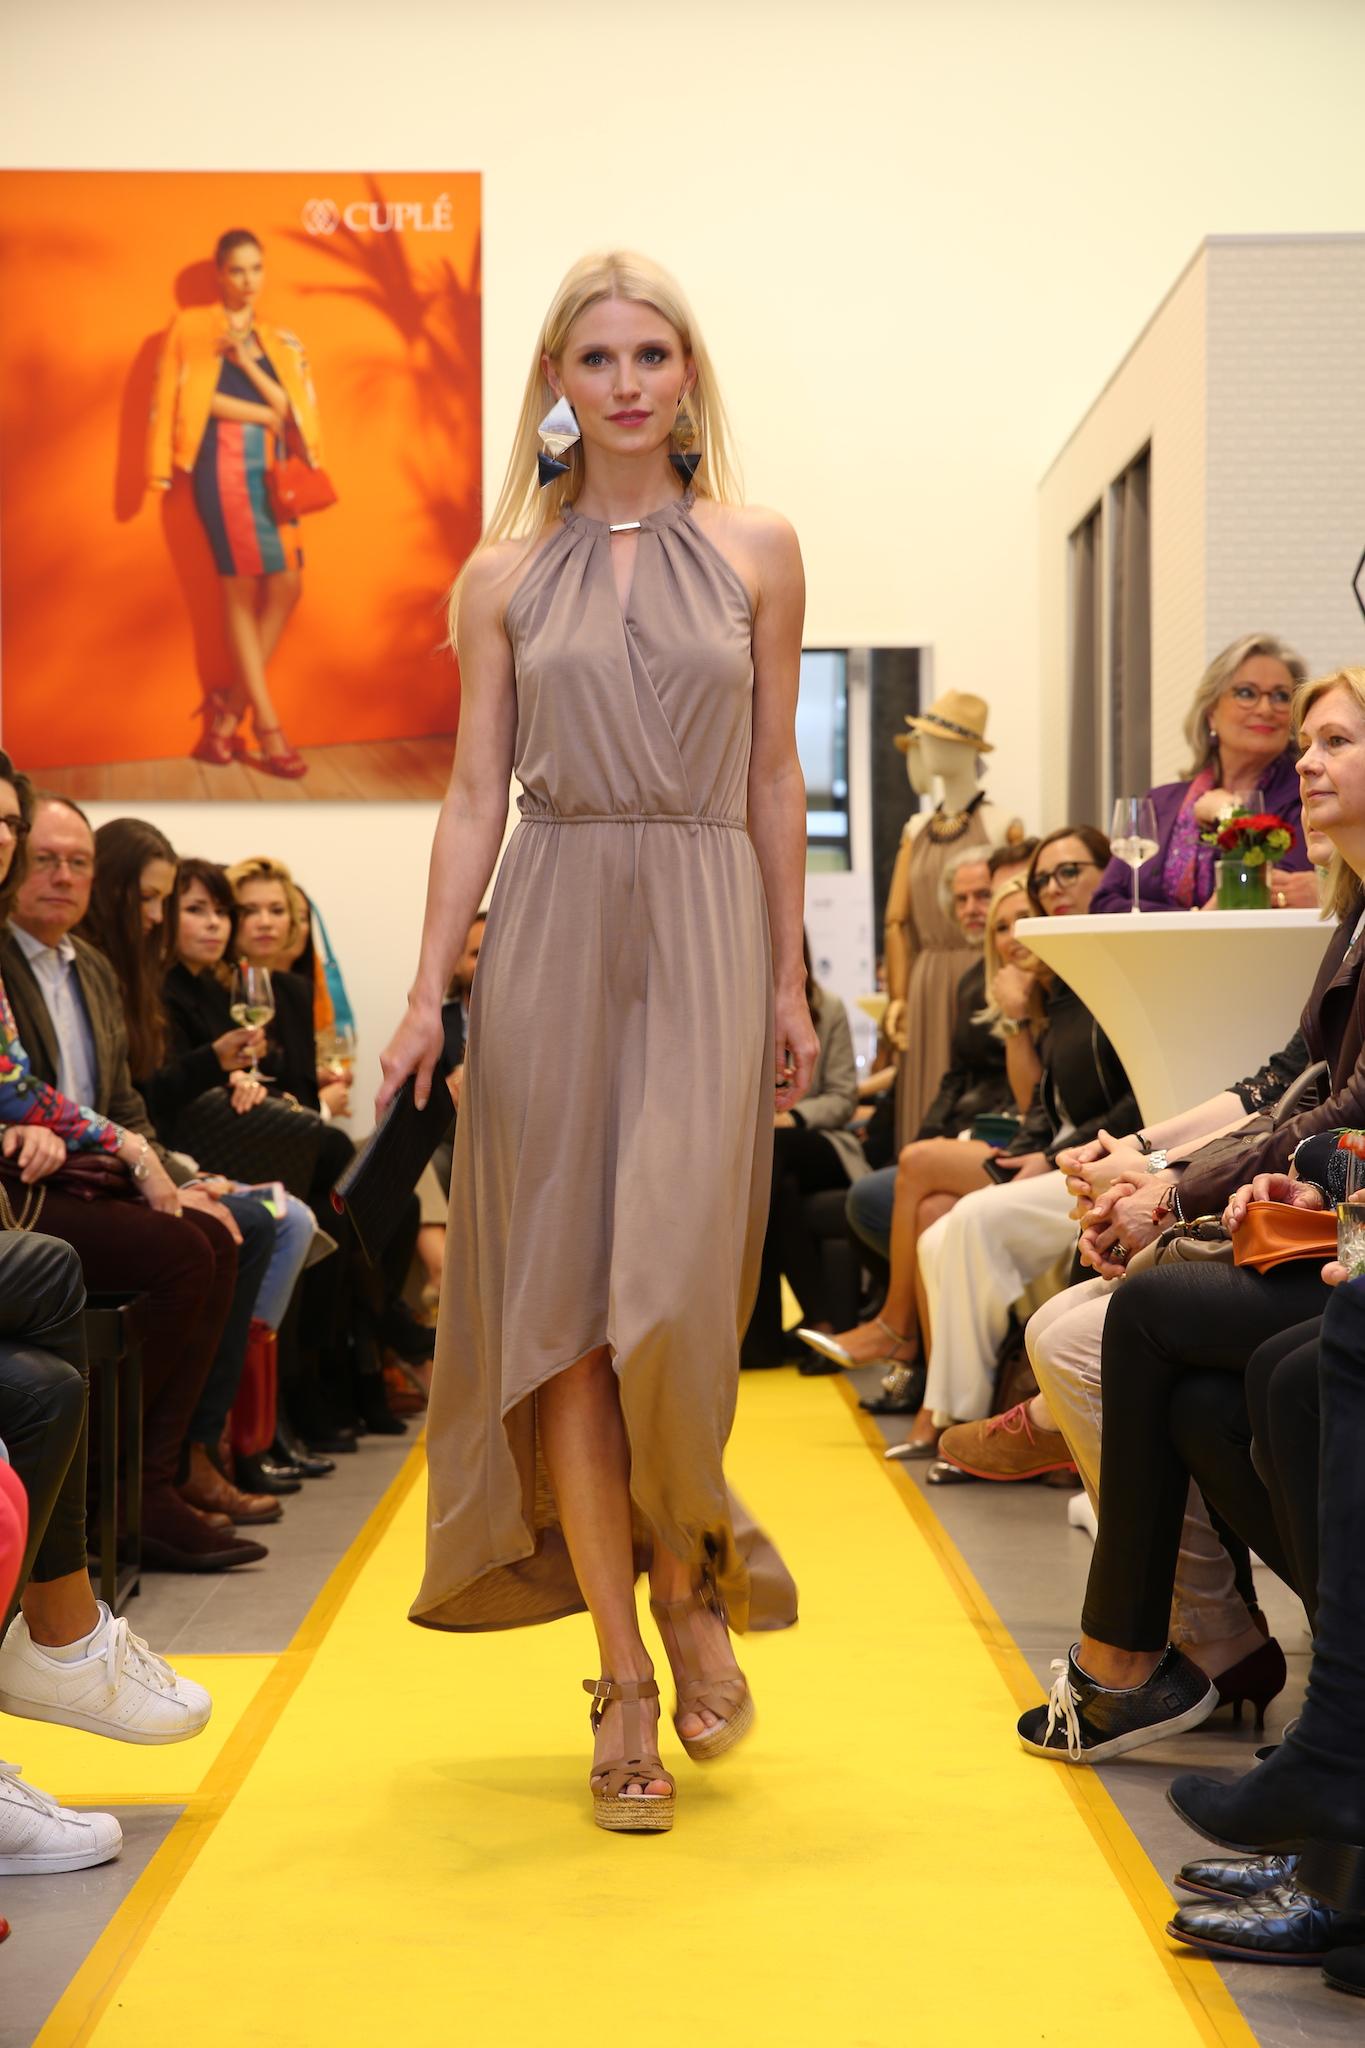 Stefanie Seifert Model, Cuplé Fashionshow, Cuplé Kleid beige, Cuplé Düsseldorf, Fashion-Blog, Lieblingsstil.com,JPG